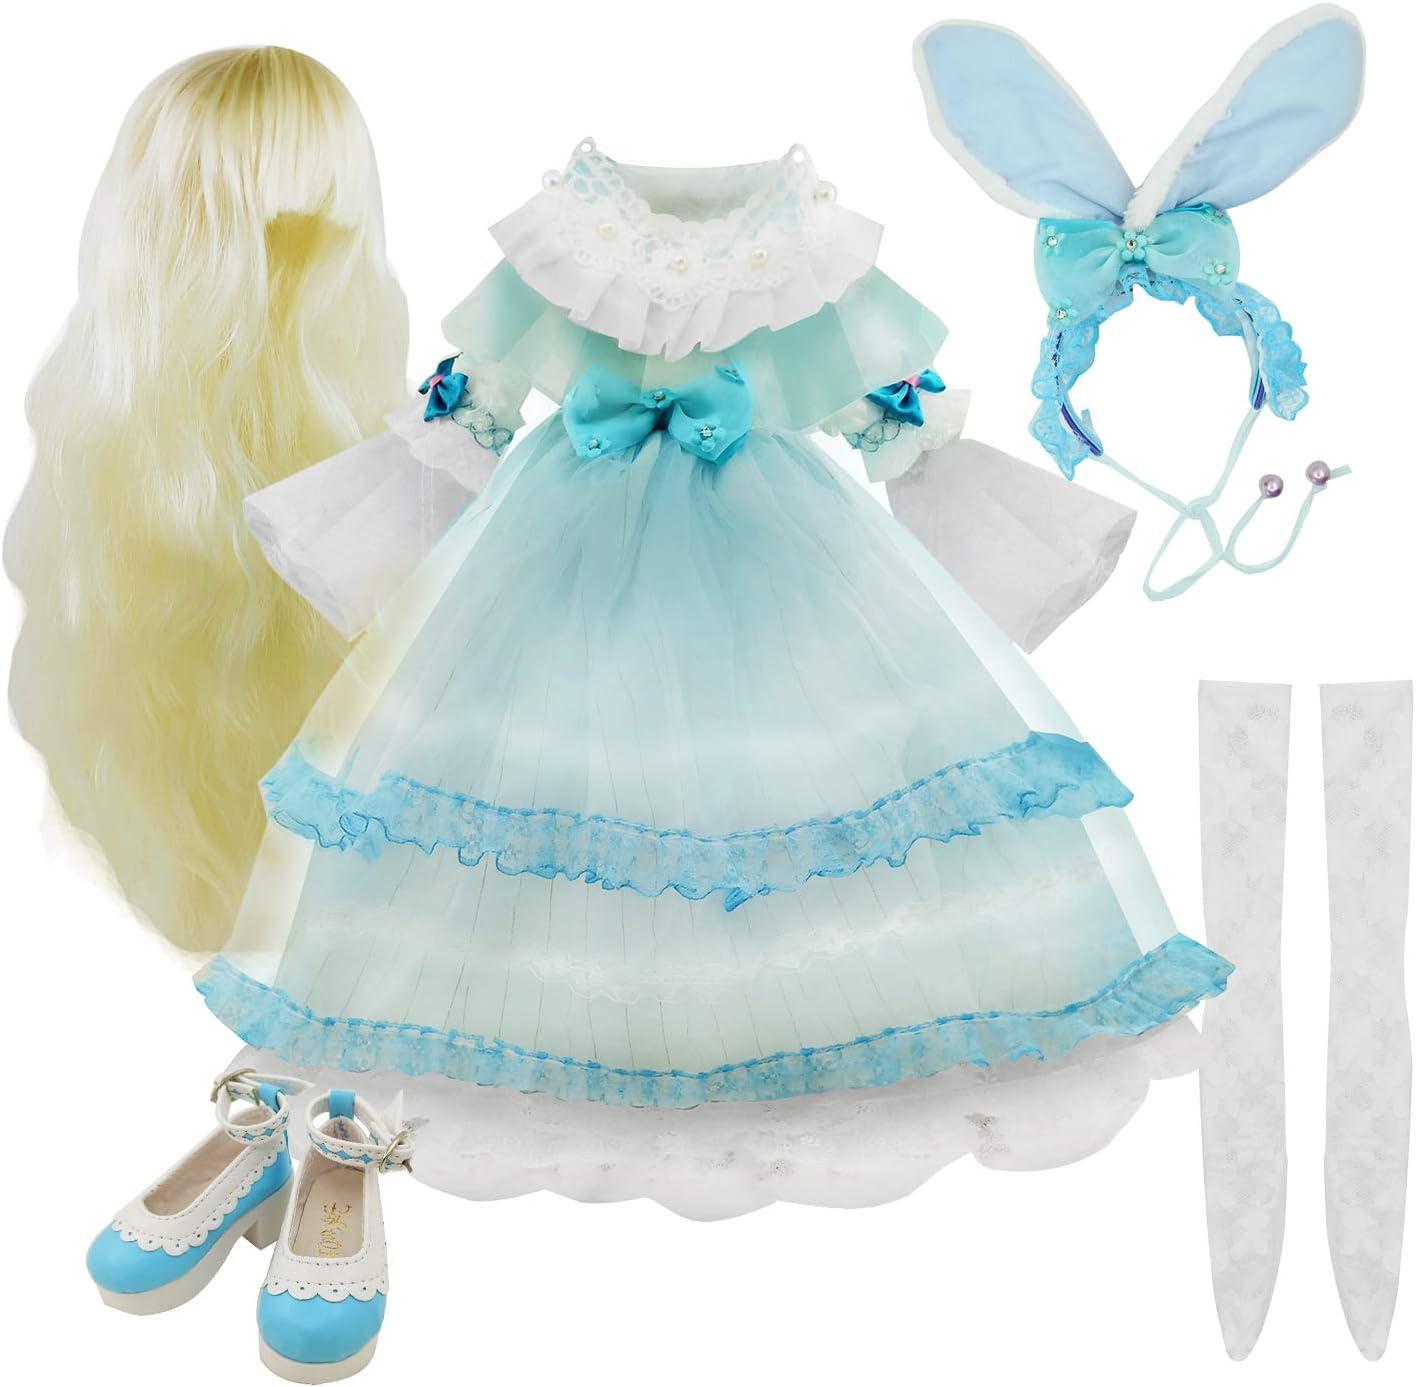 EVA BJD Dolls' Skirt Wig Shoes Socks Accessories Full Set for 20-23inch 1/3 60cm BJD Doll (Rona)